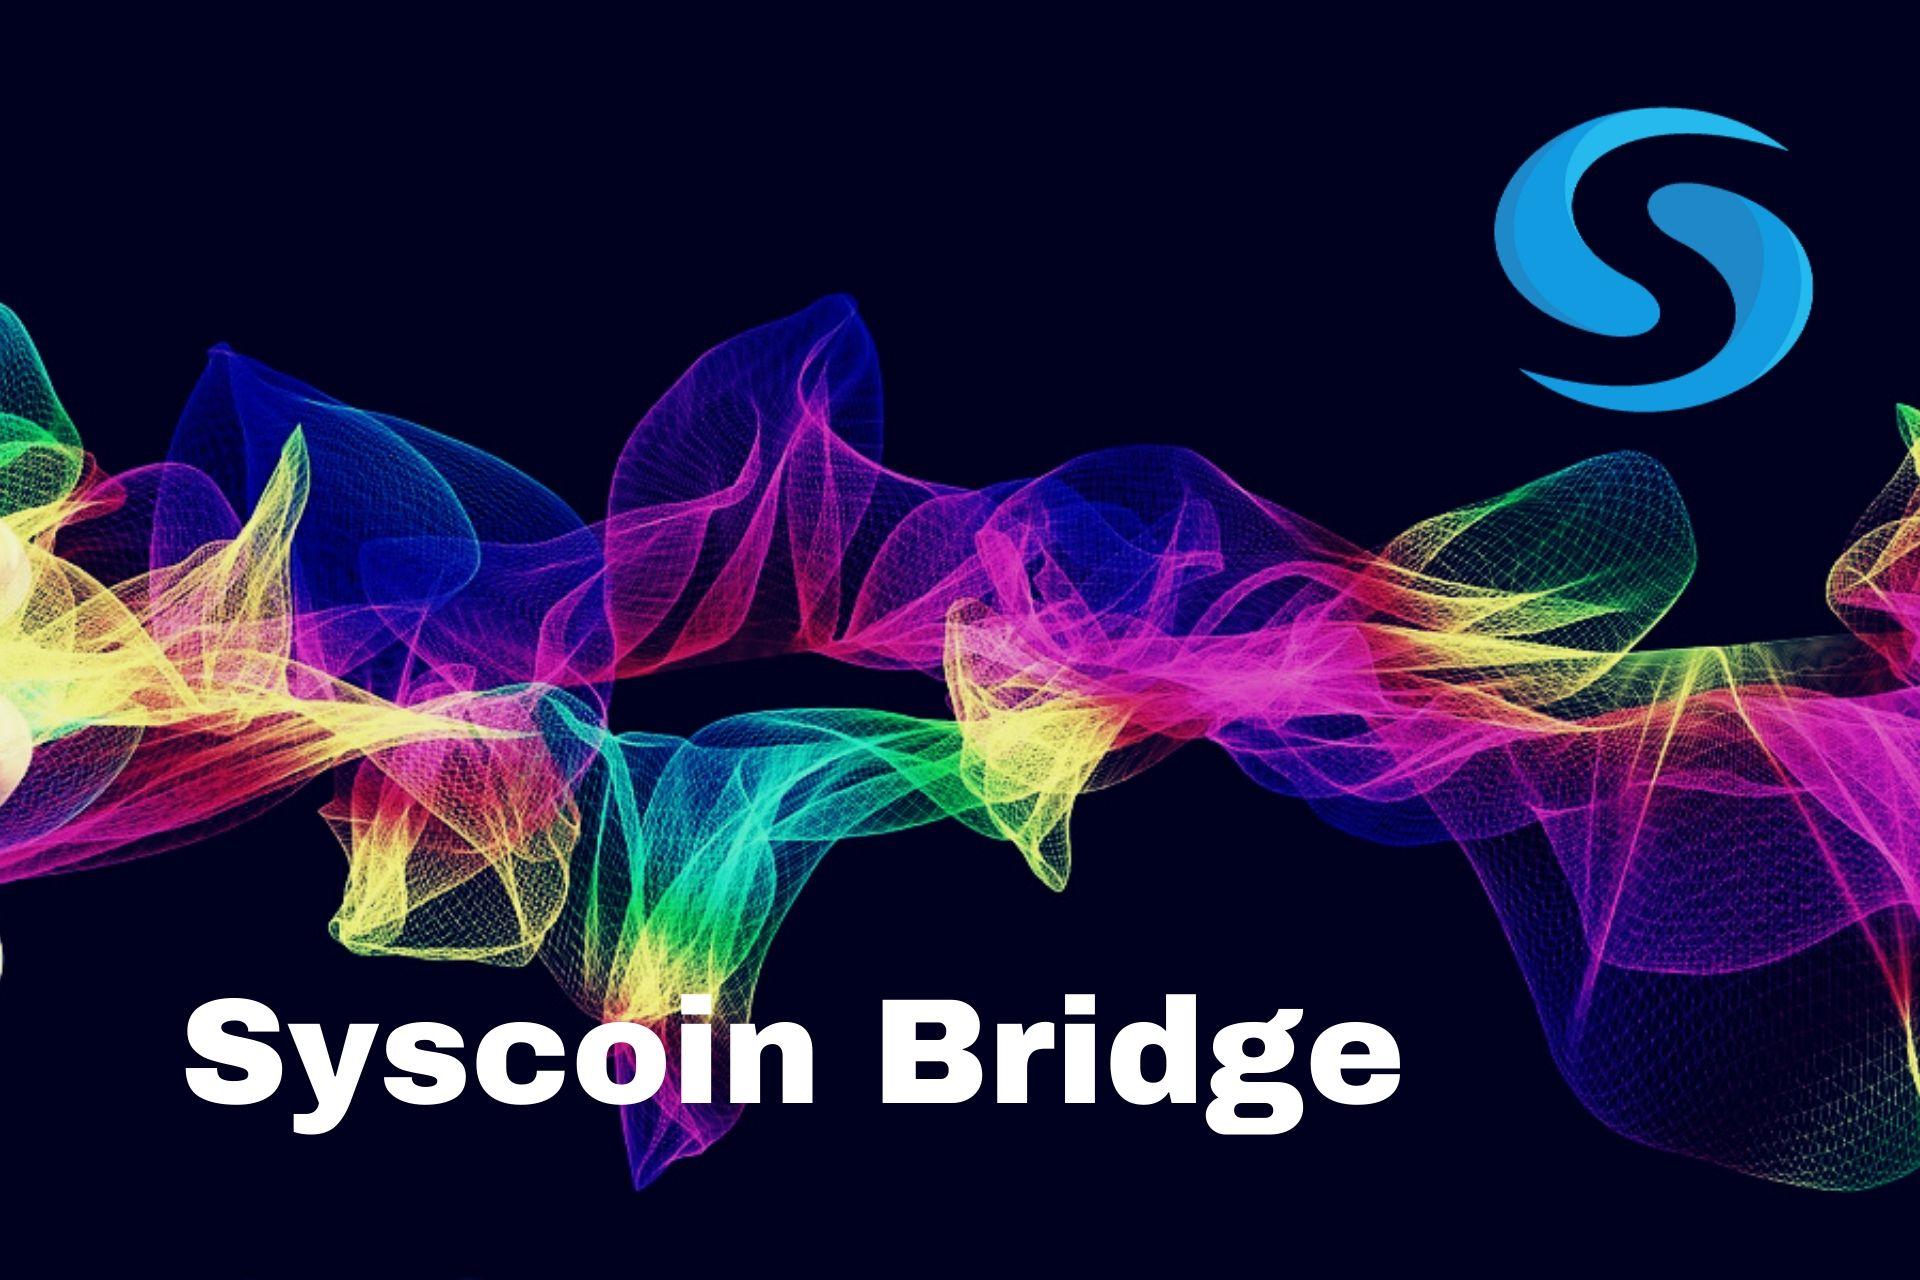 Introducing Syscoin Bridge – Easy Interoperability With The Ethereum Blockchain